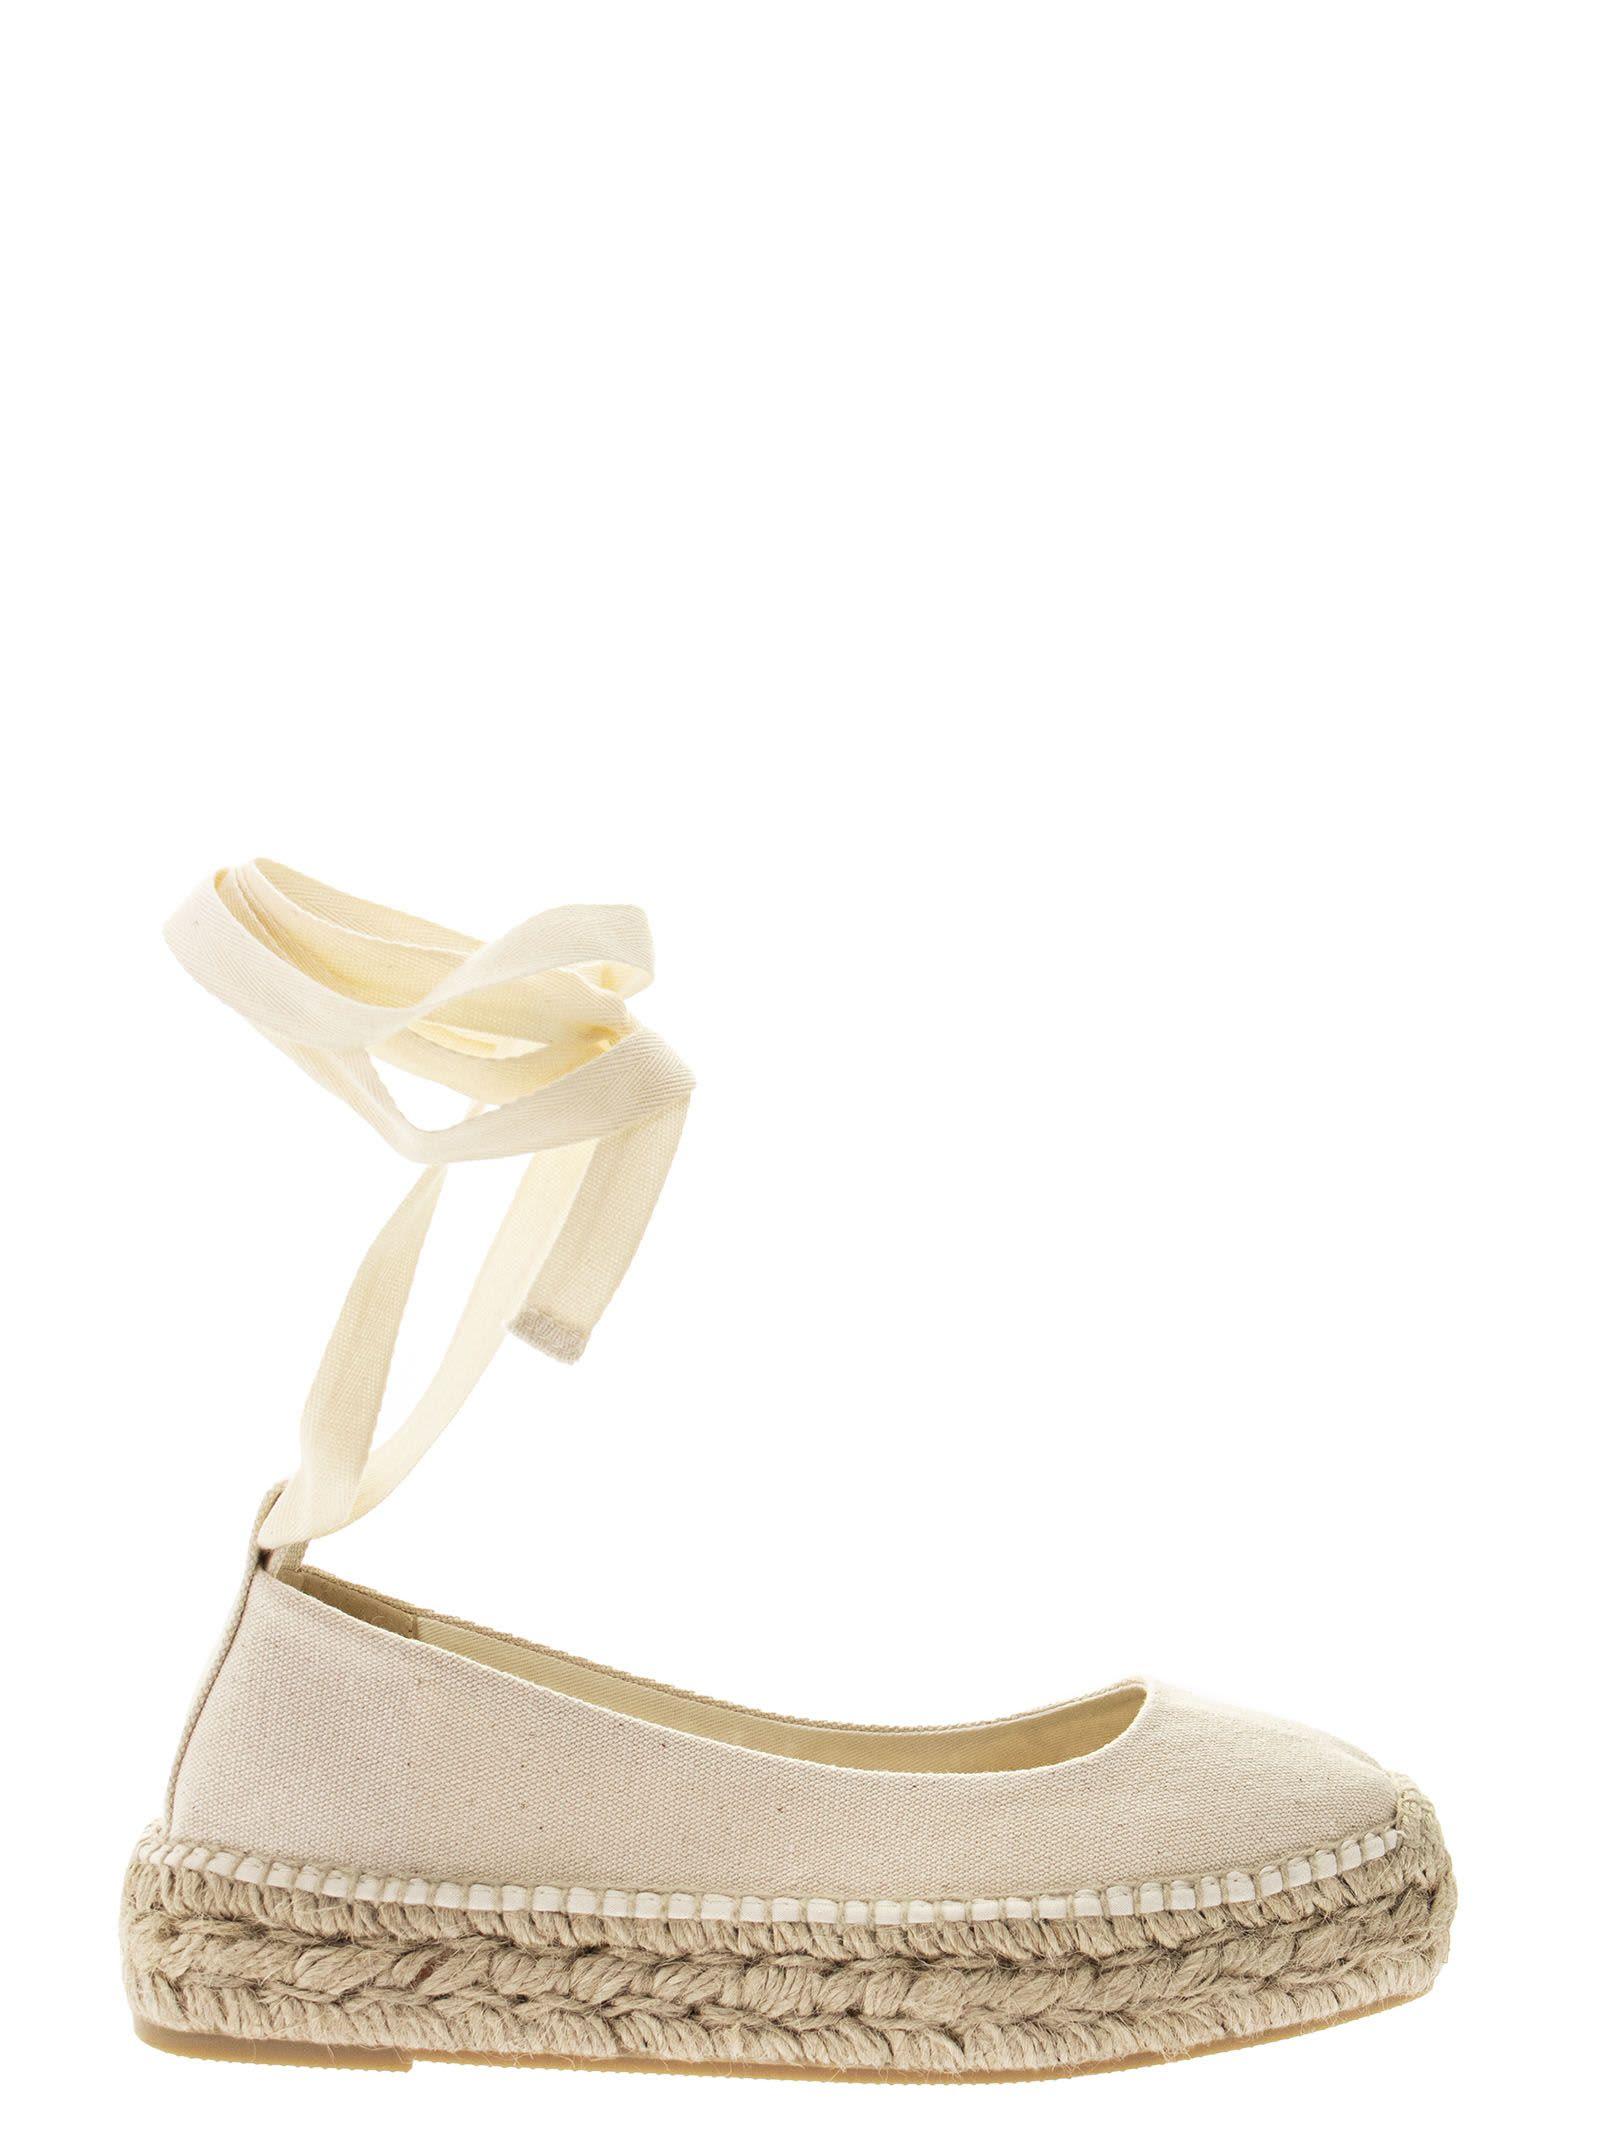 Buy Ralph Lauren Canvas Platform Espadrille online, shop Ralph Lauren shoes with free shipping